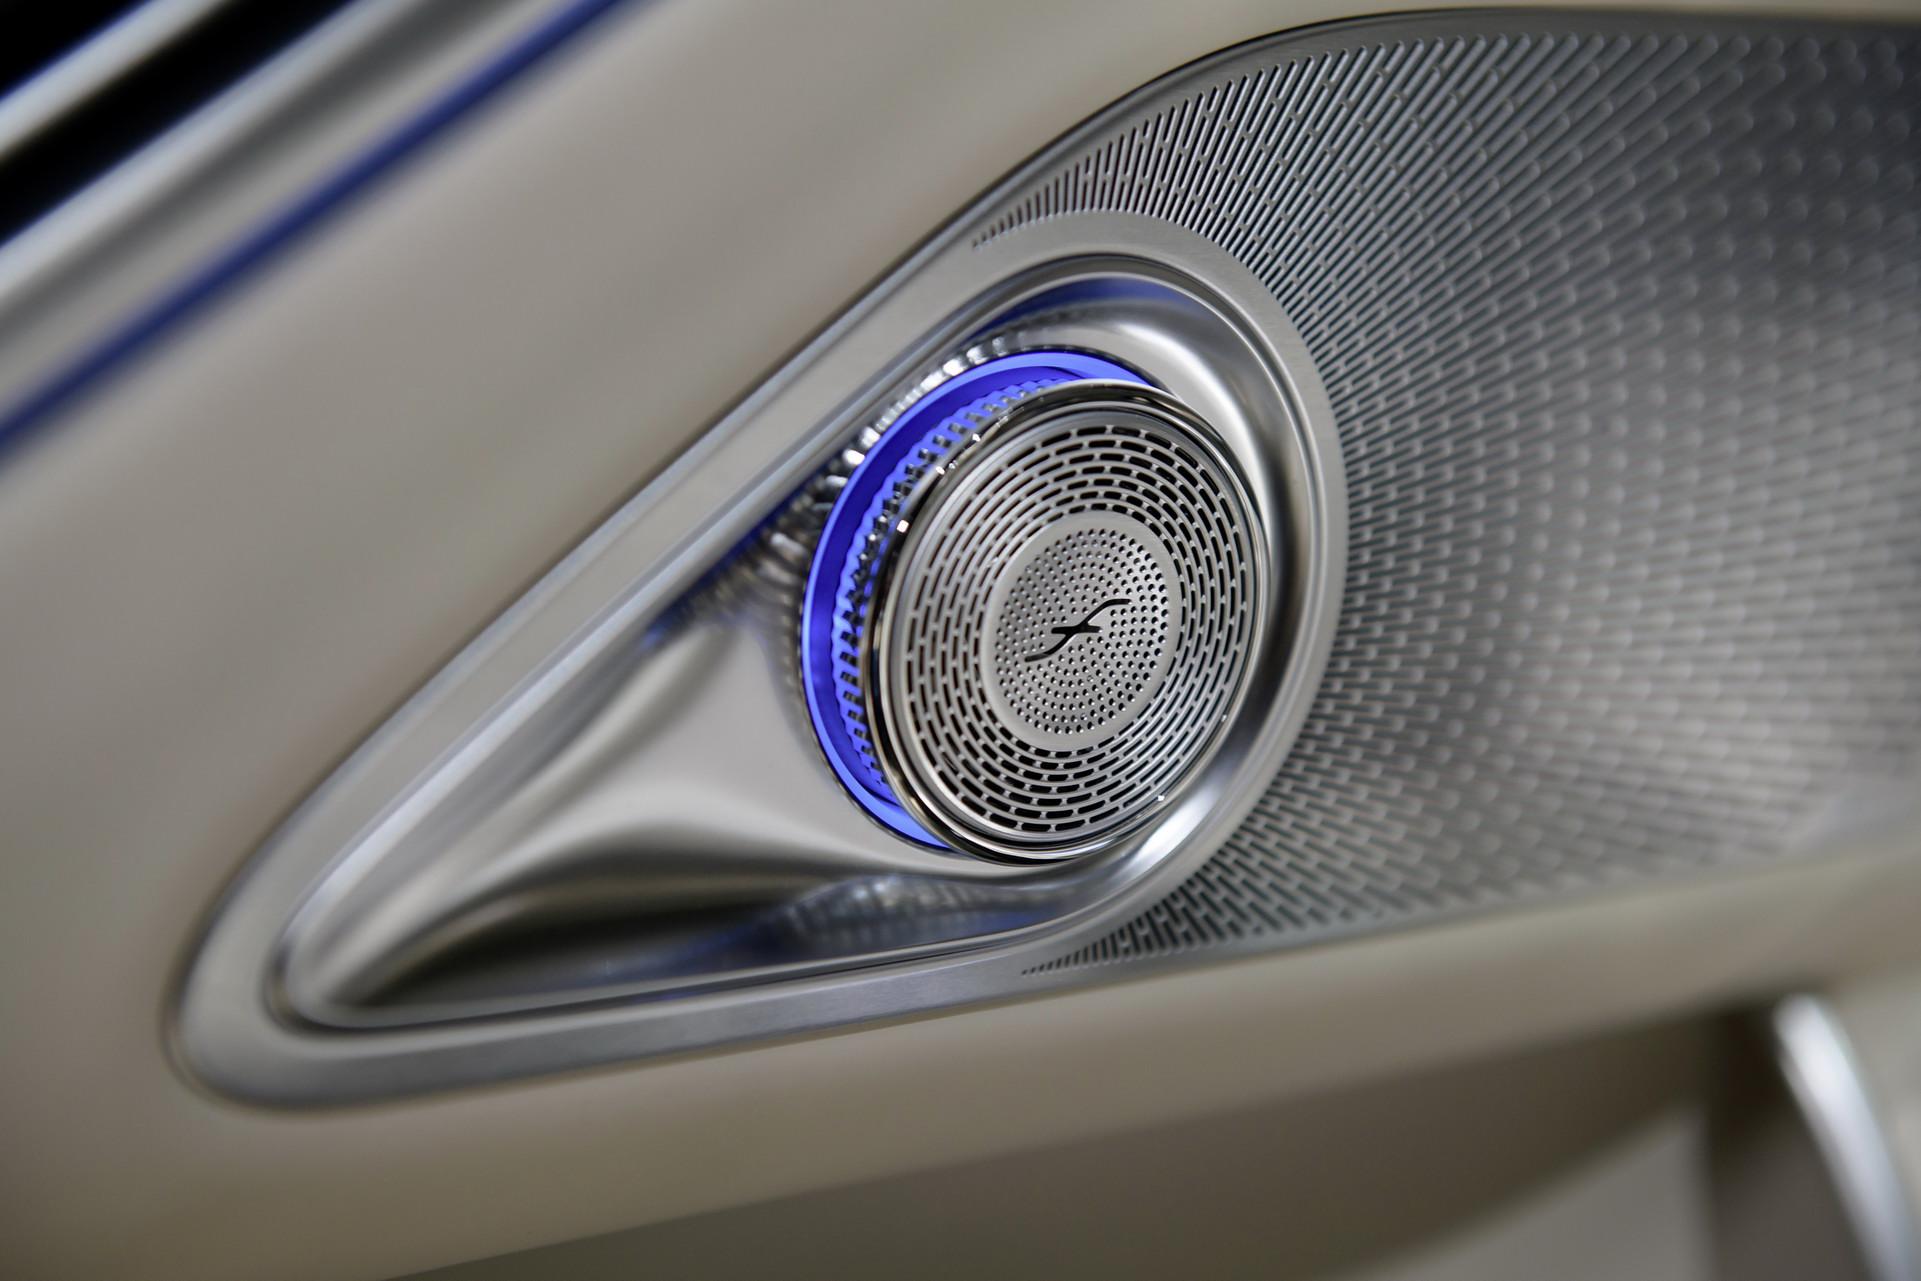 Loa-chat-luong-cao-xe-Mercedes-Maybach-S-Class-2021-giaxehoi-vn